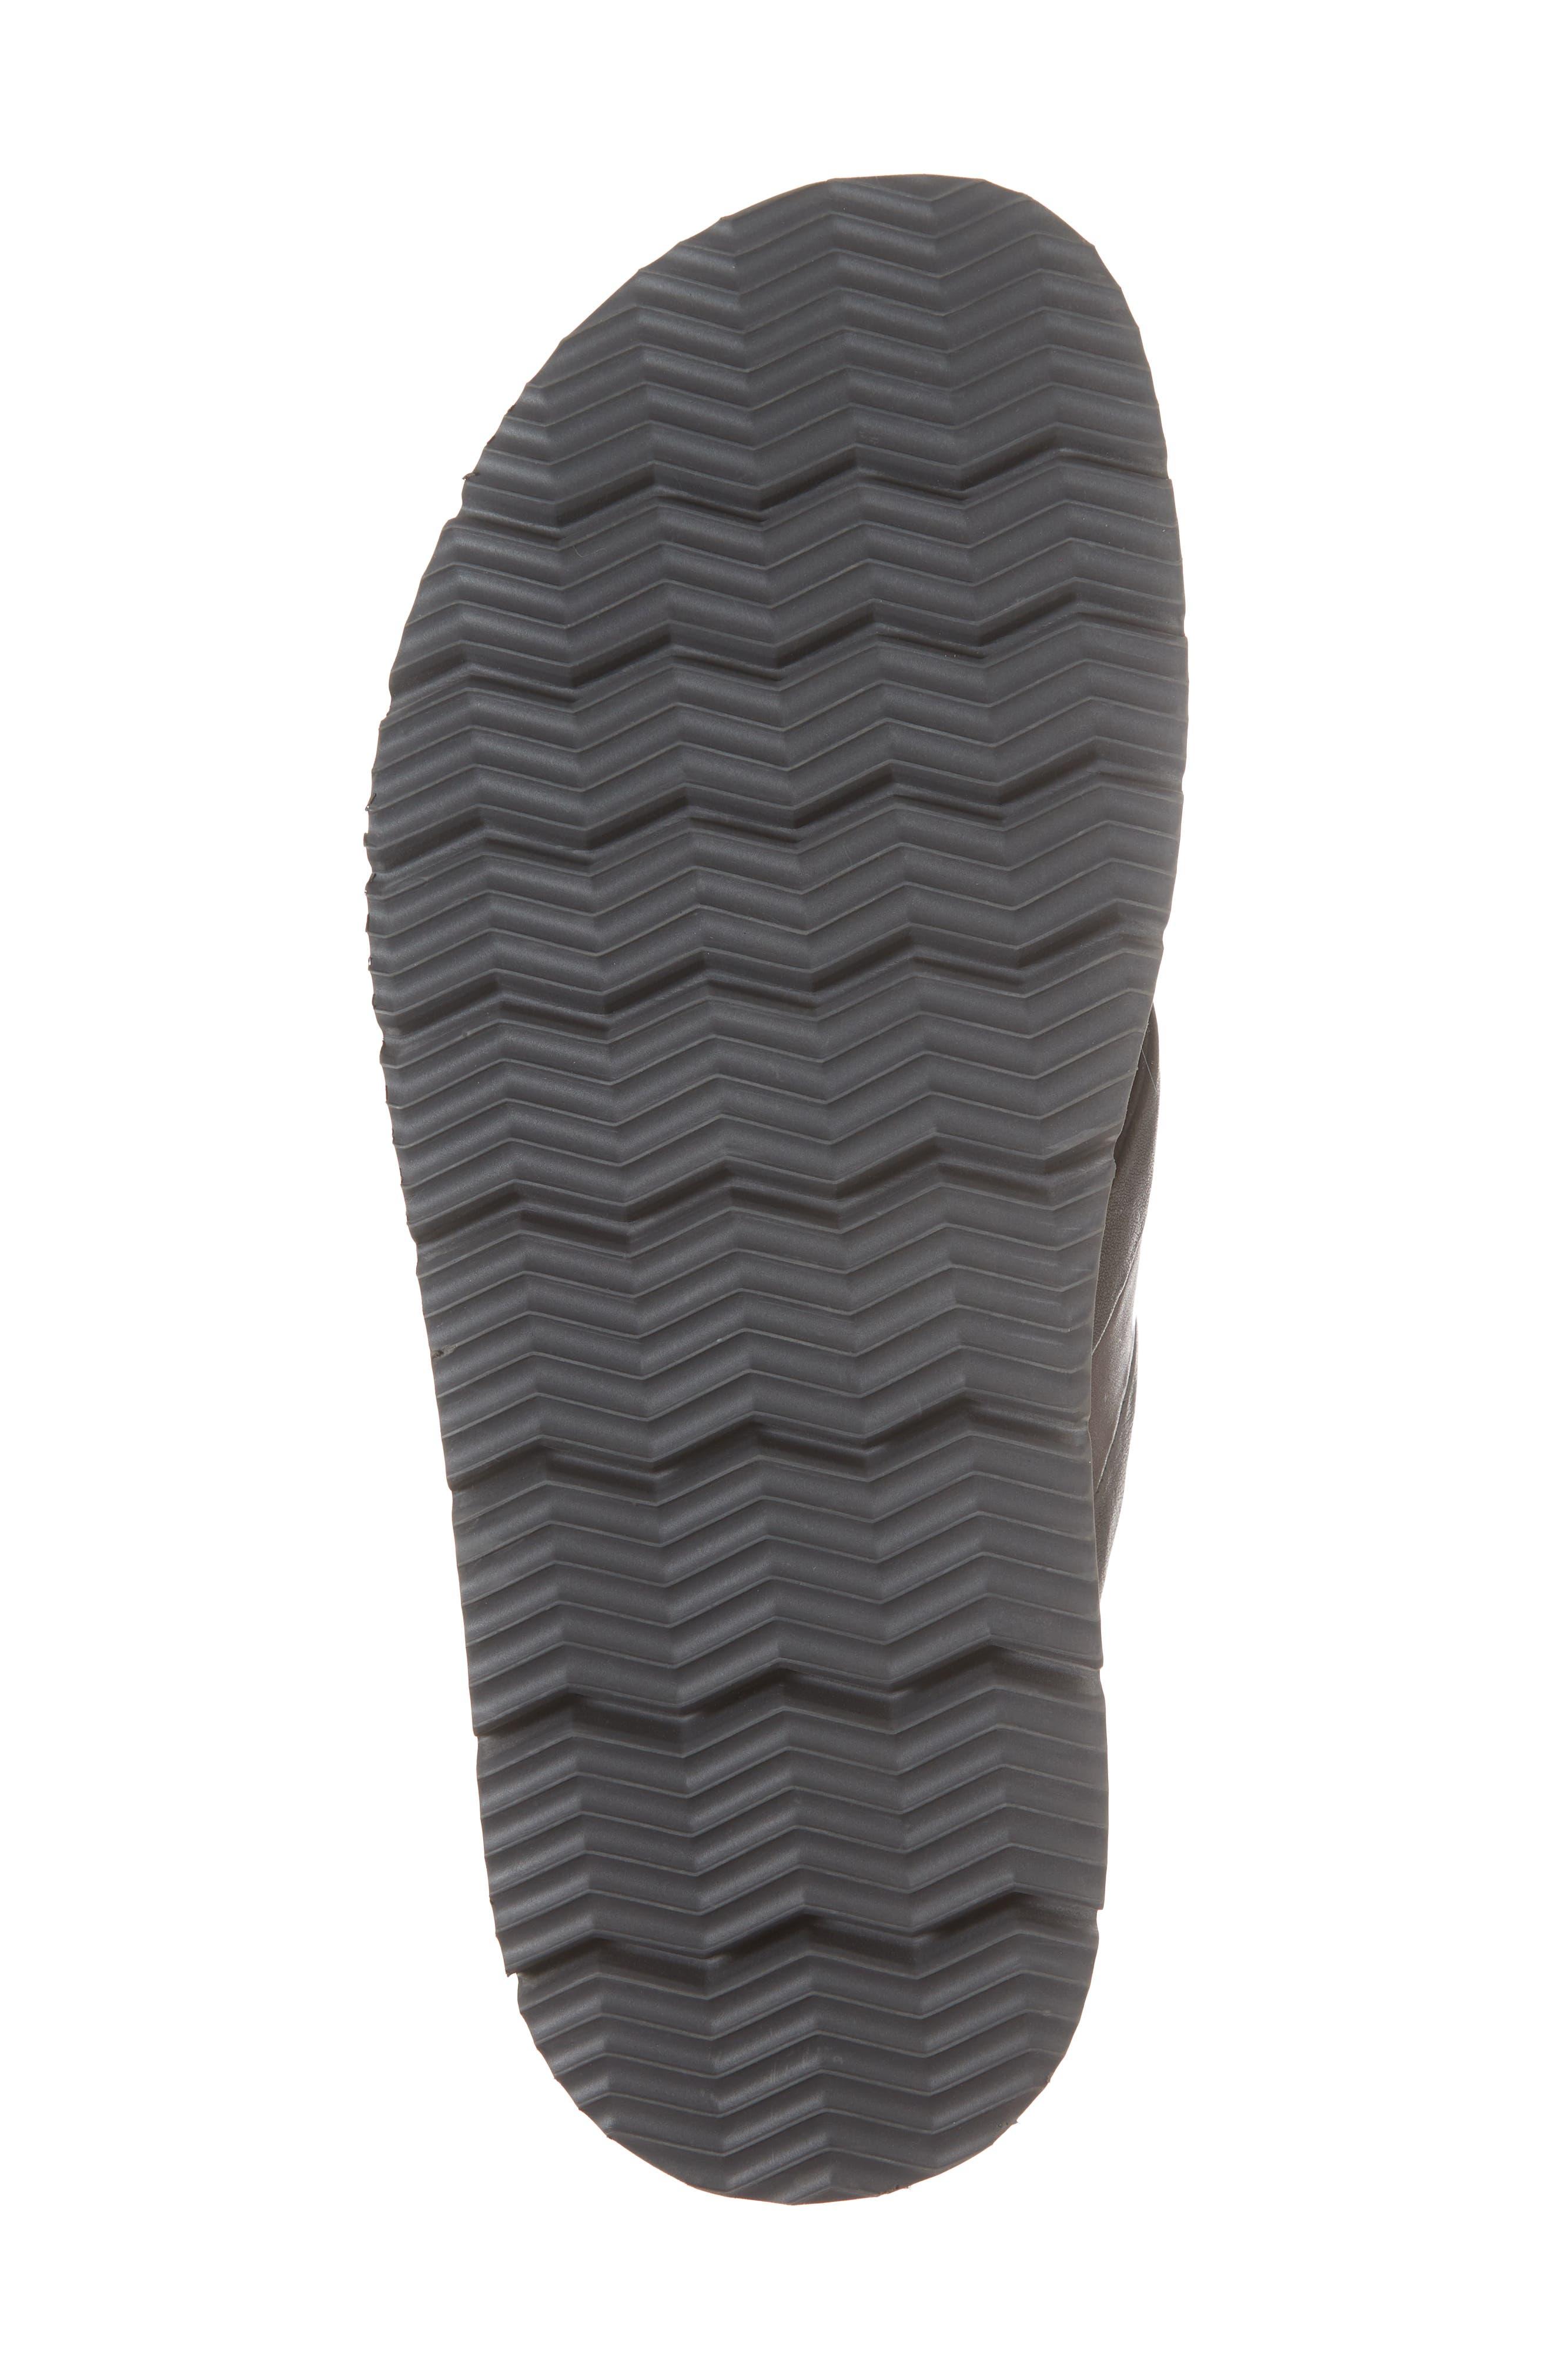 DONALD PLINER,                             Bryce Striped Flip Flop,                             Alternate thumbnail 6, color,                             001